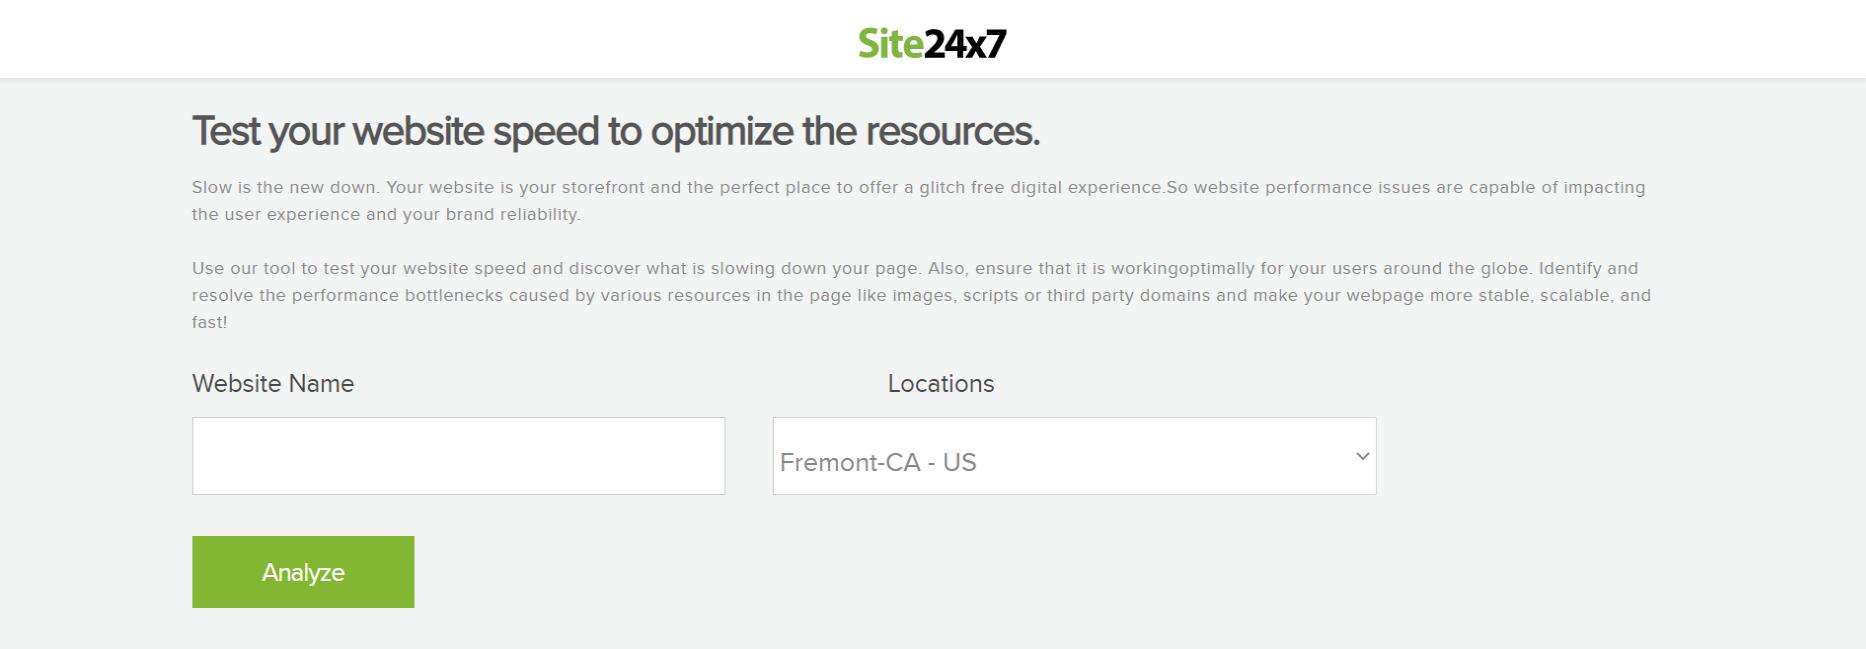 Site24x7-Best Website Page Speed Test Tools-Mobile Site-Desktop Site